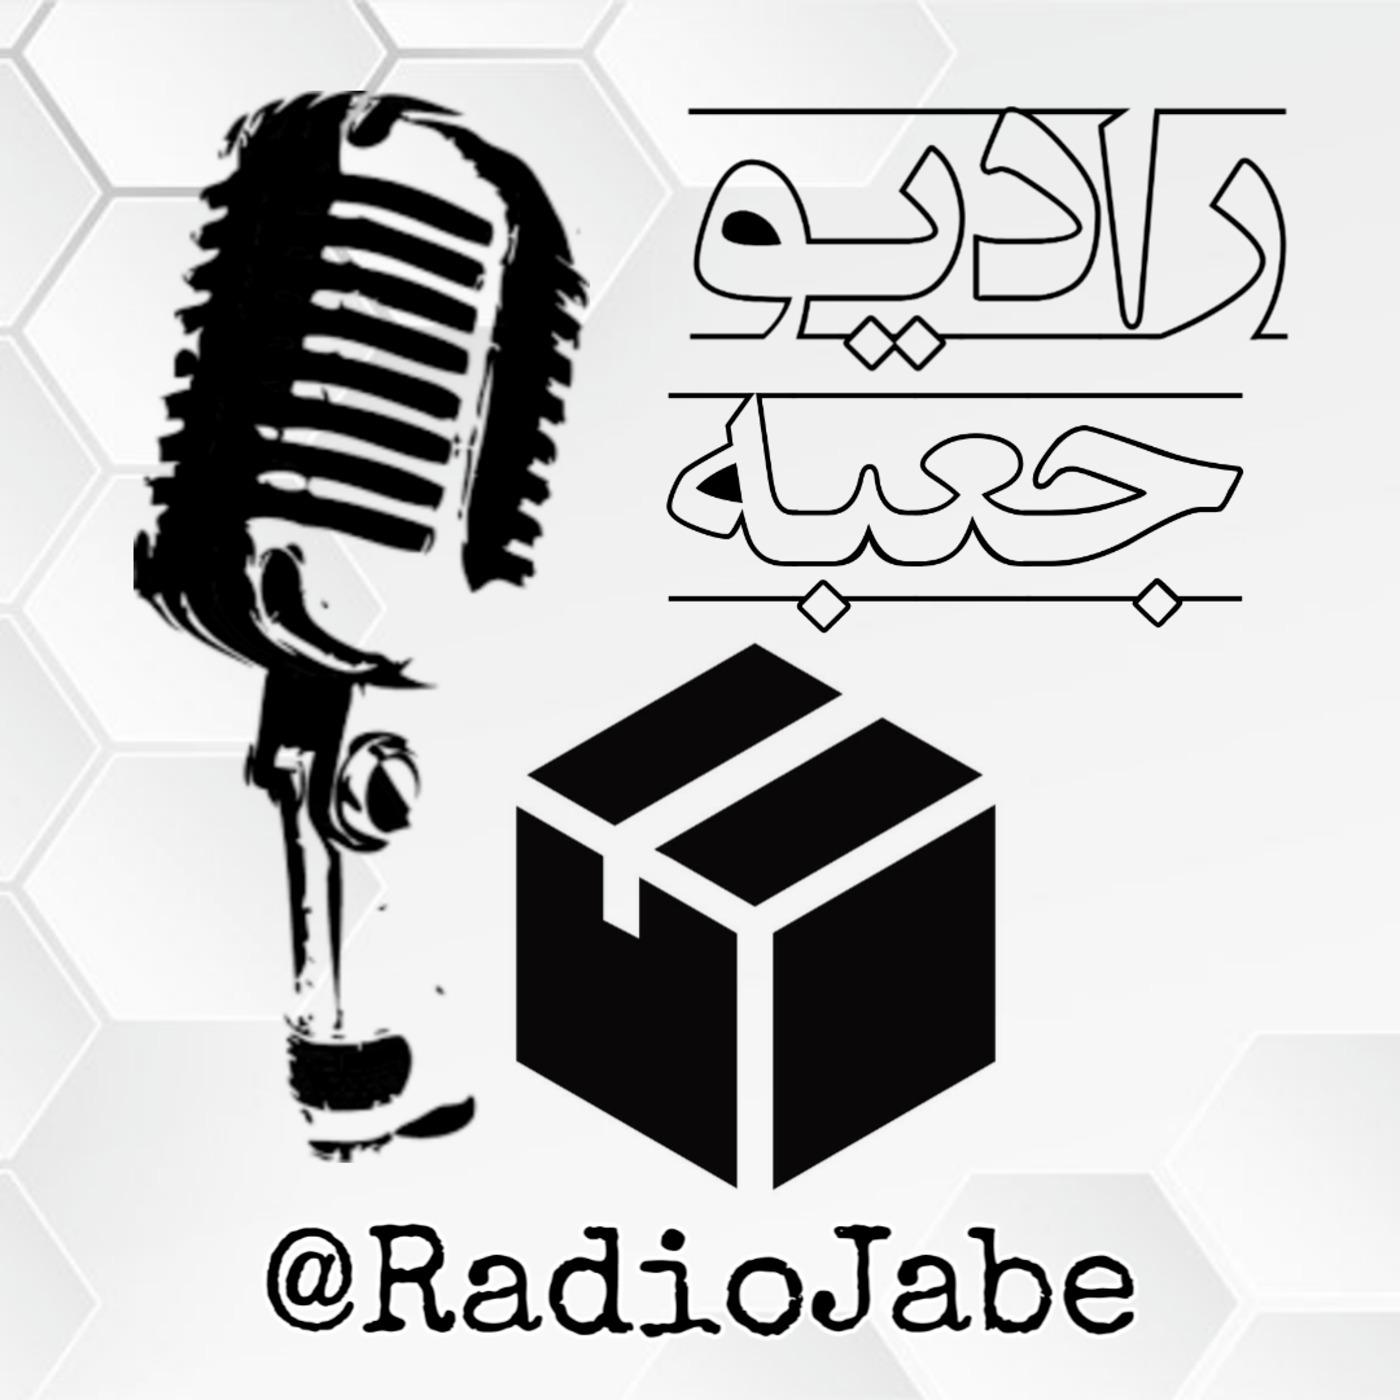 Radio Jabe   پادکست فارسی رادیو جعبه